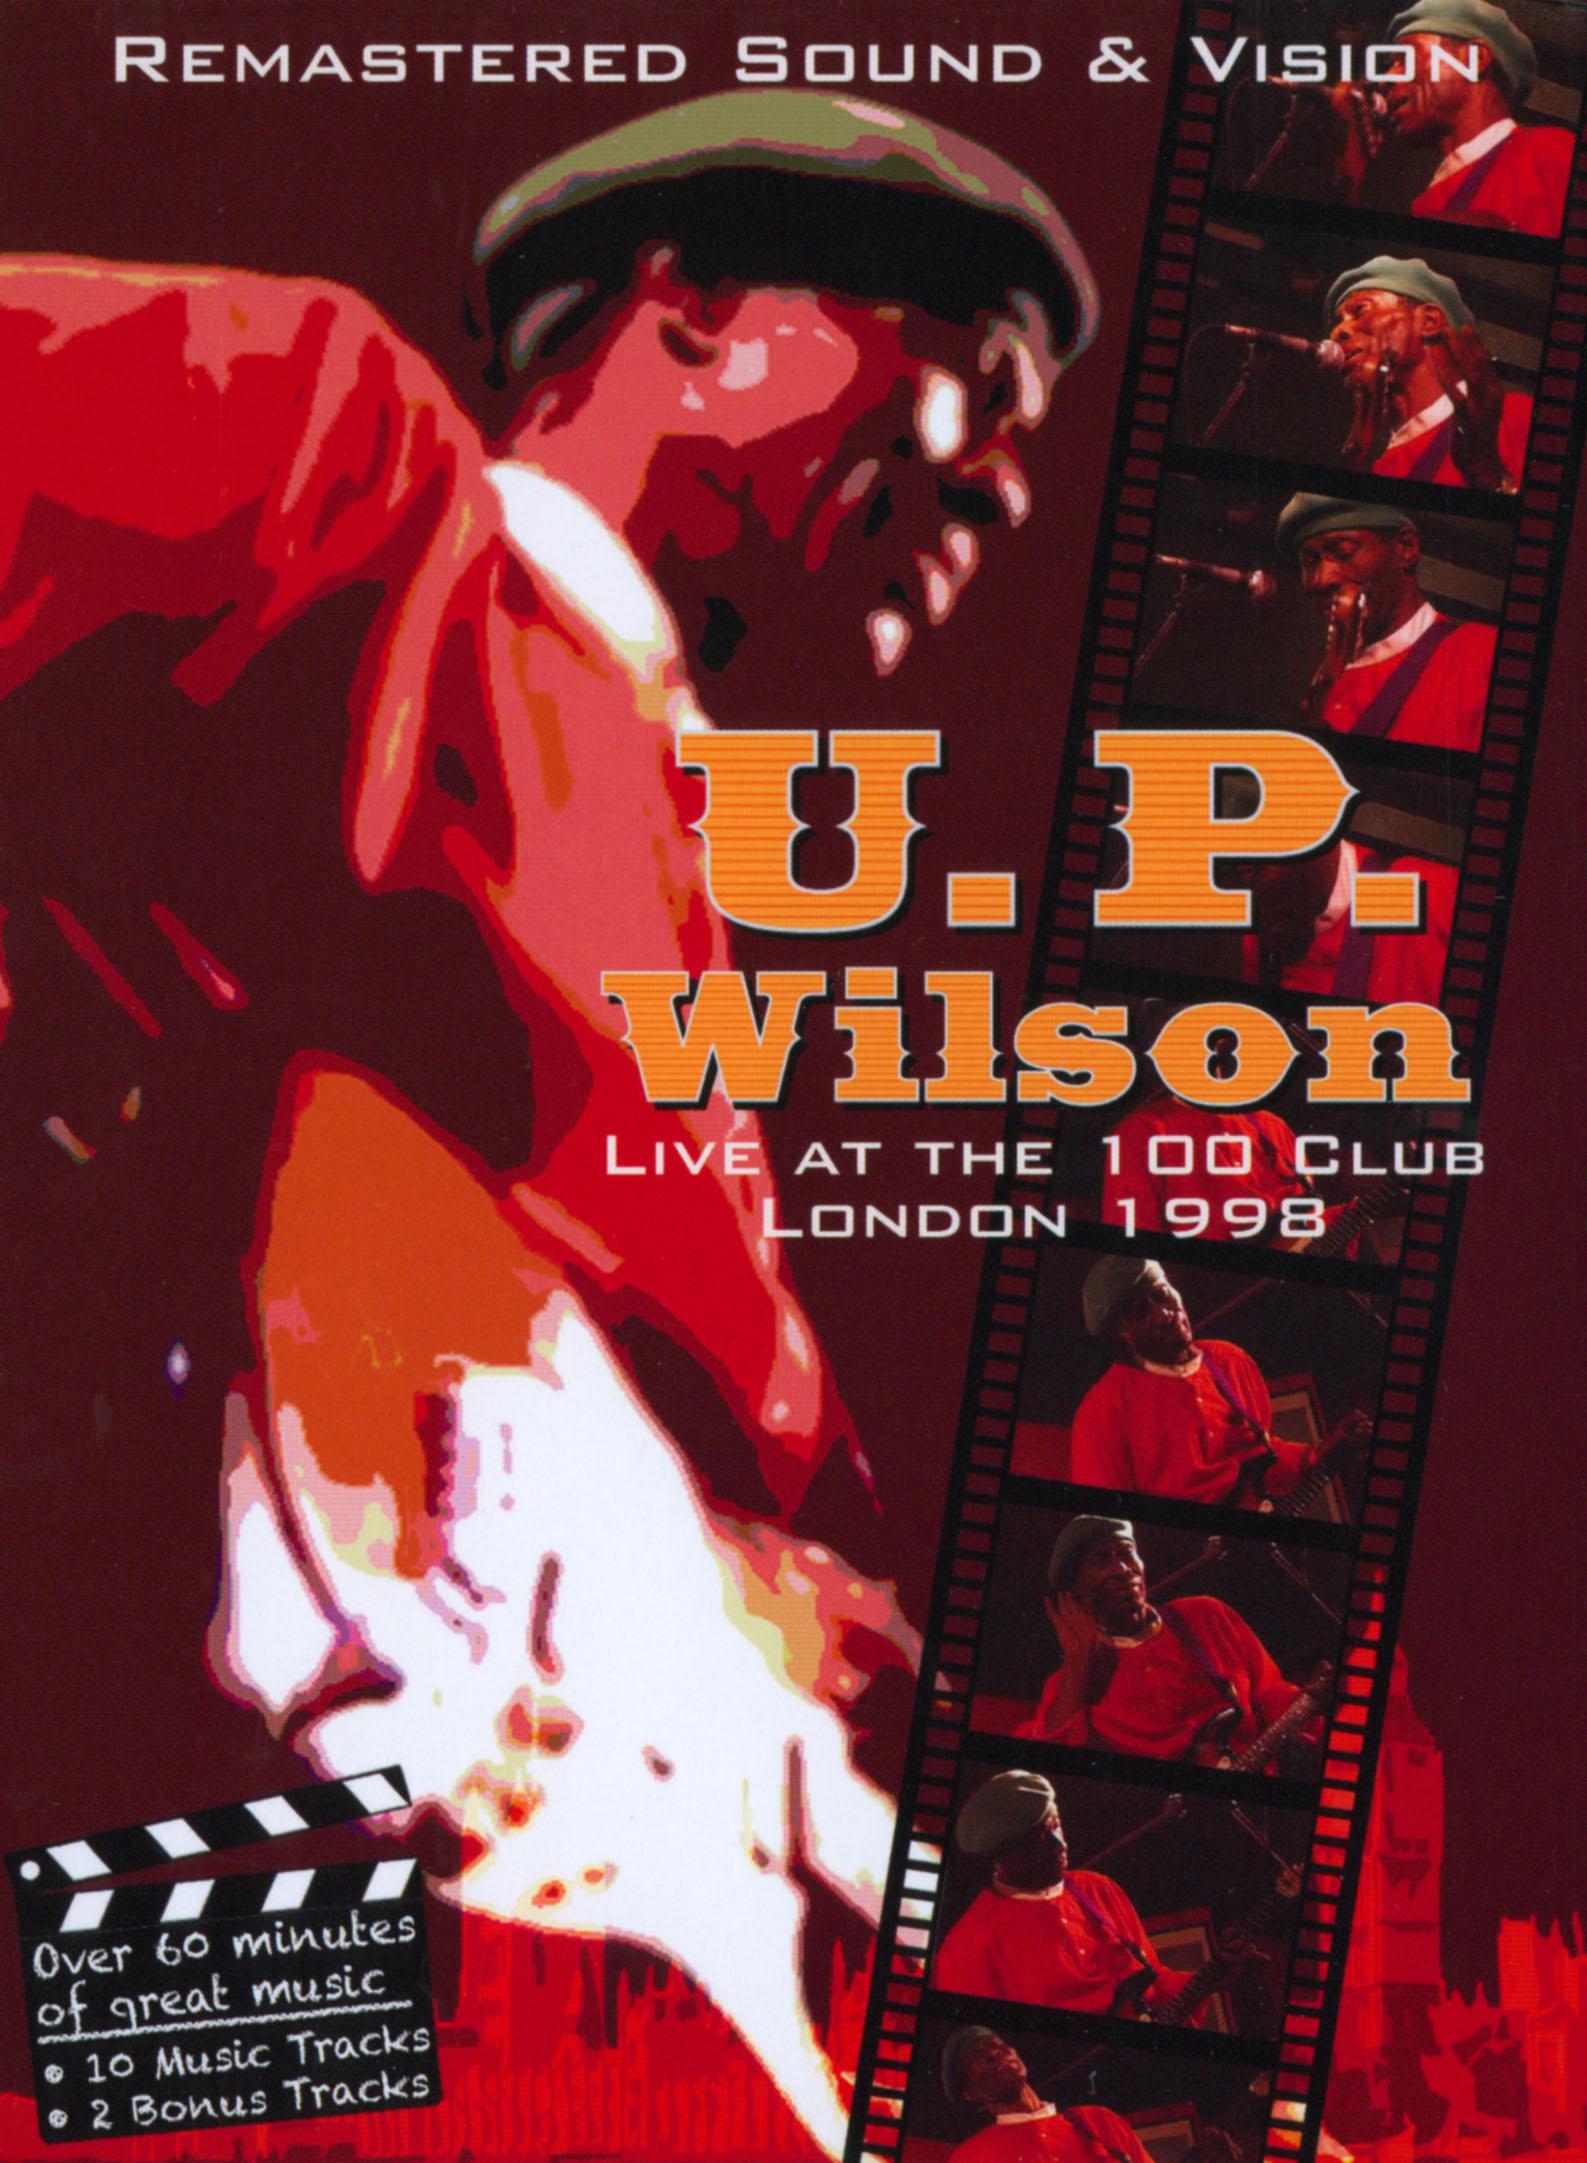 U.P. Wilson: Live at the 100 Club, London 1998